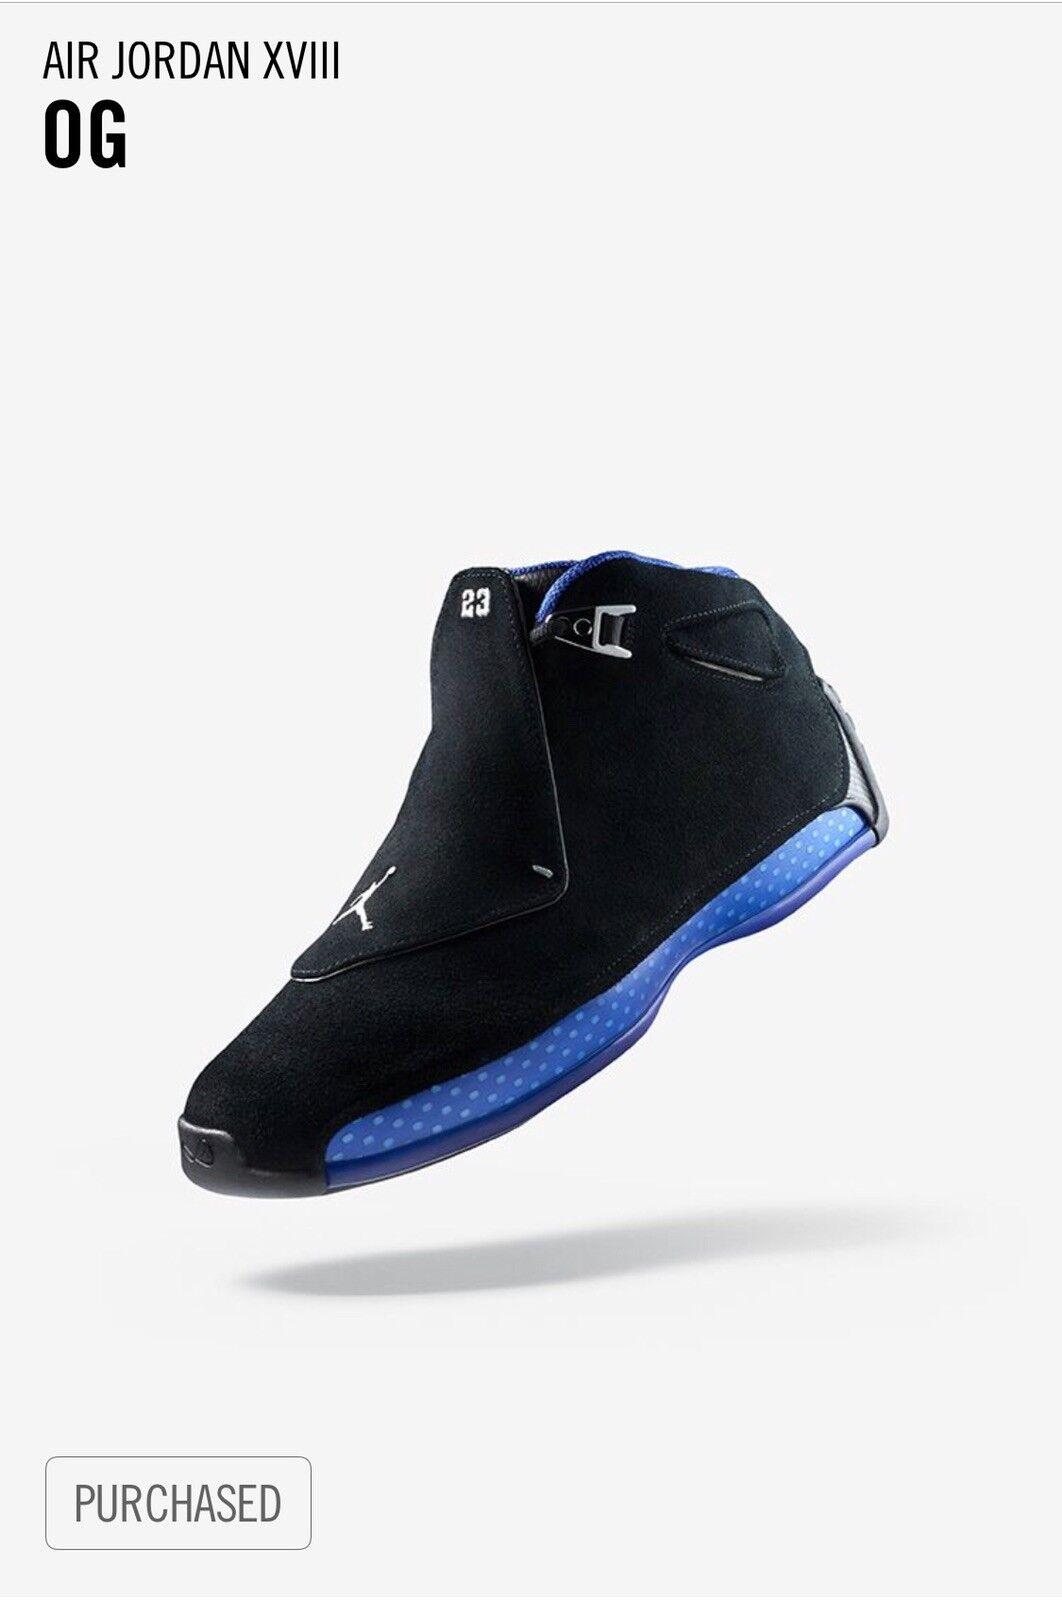 4ec59239a5c Jordan XVIII Size 12 DS nqfebx3666-Athletic Shoes - mixed.zweiakter.com